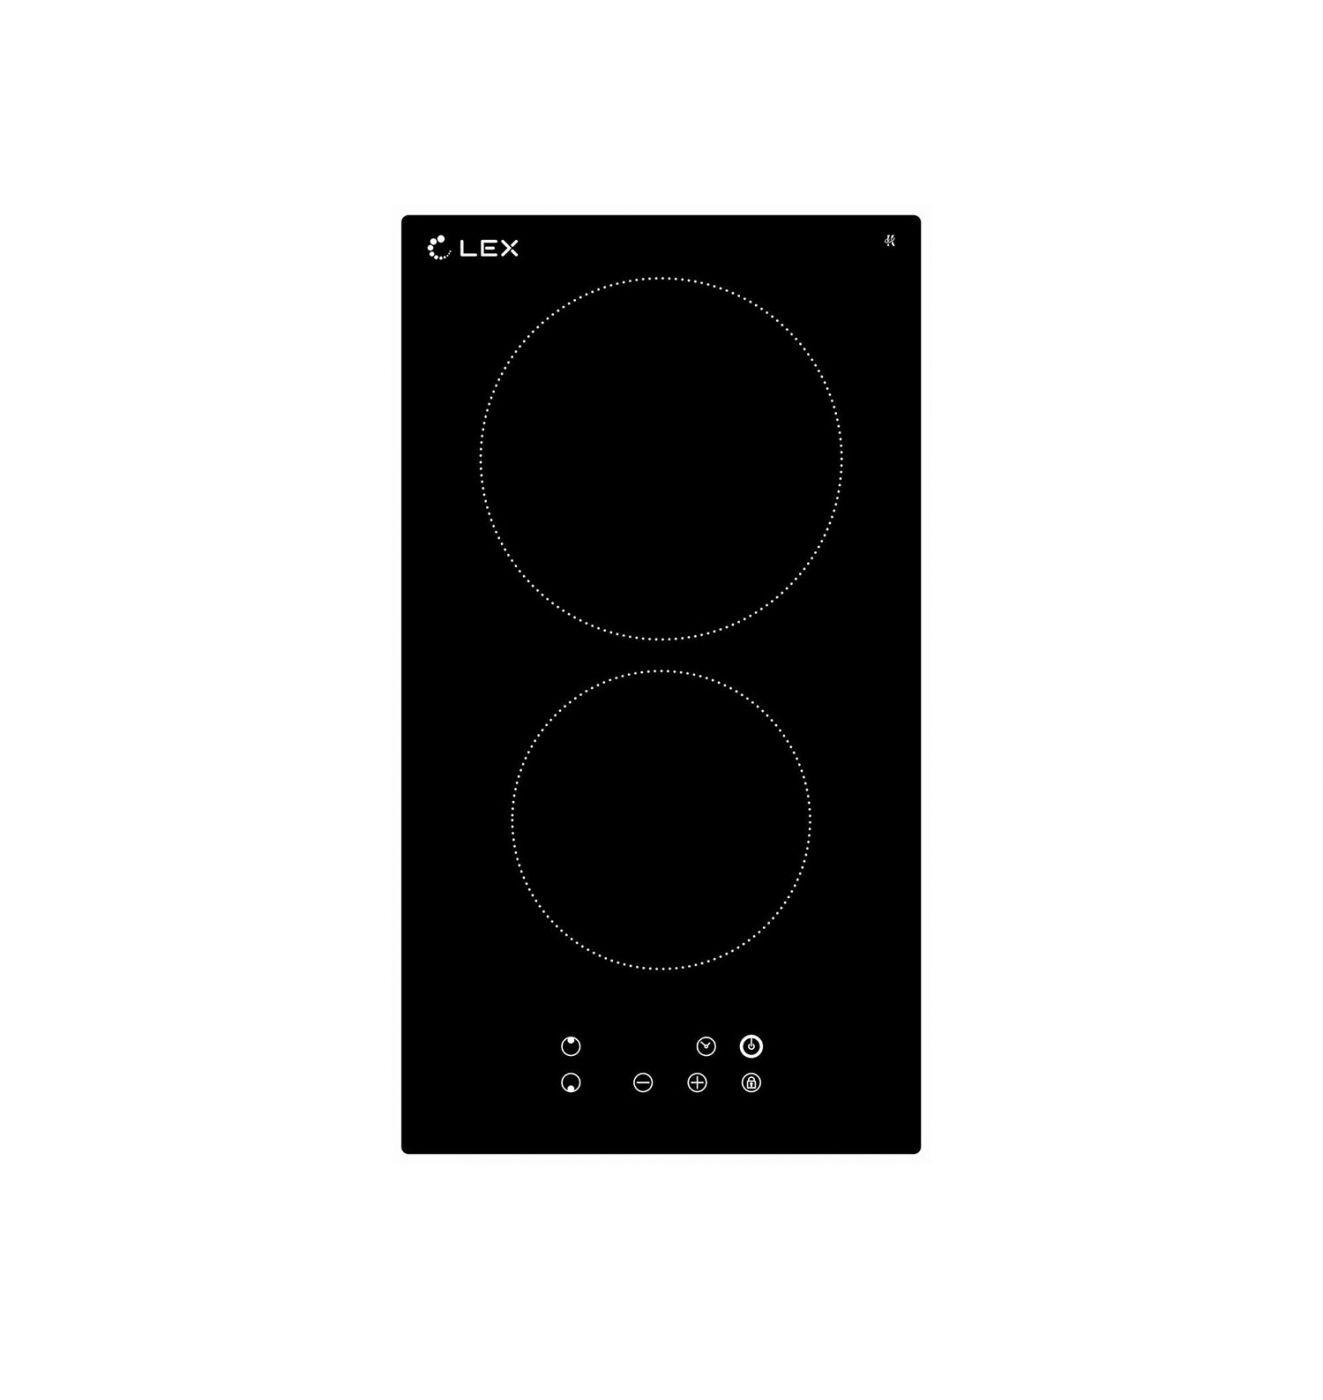 Электрическая варочная панель LEX EVH 320 BL (CHYO000174)